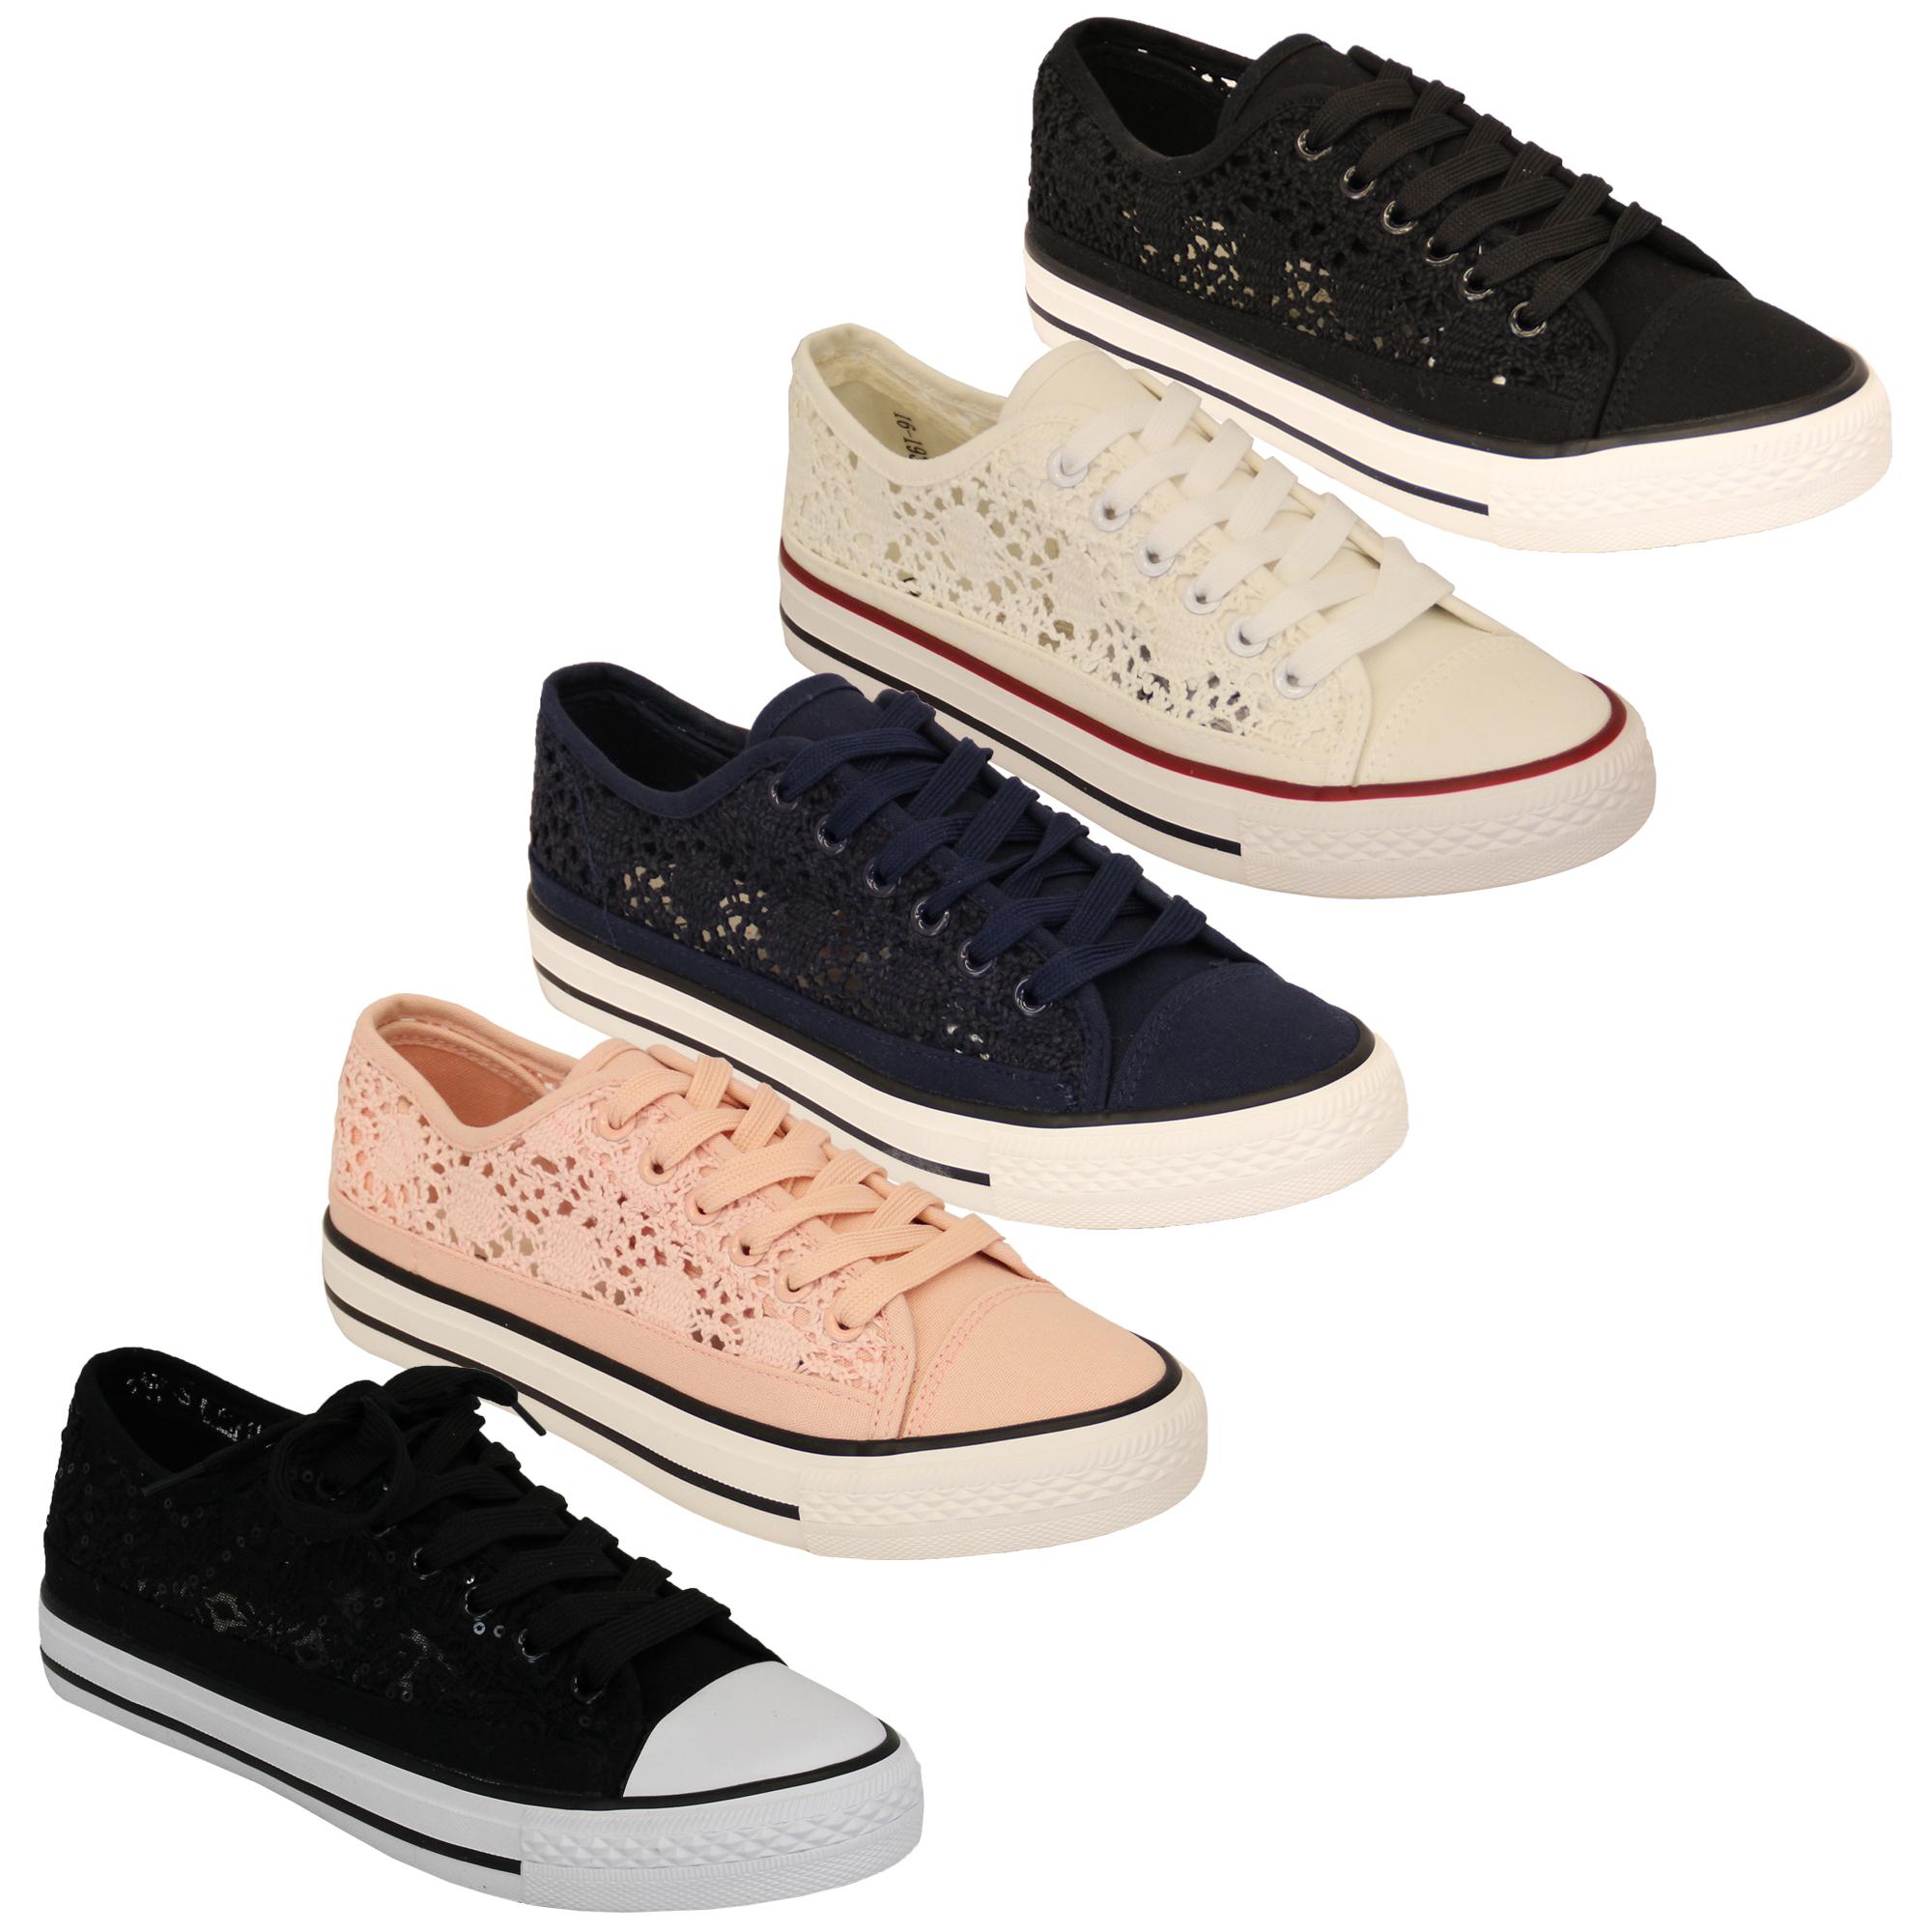 Ladies Trainers Womens Flat Skate Funky Lace Crochet Floral Canvas Pumps Shoes